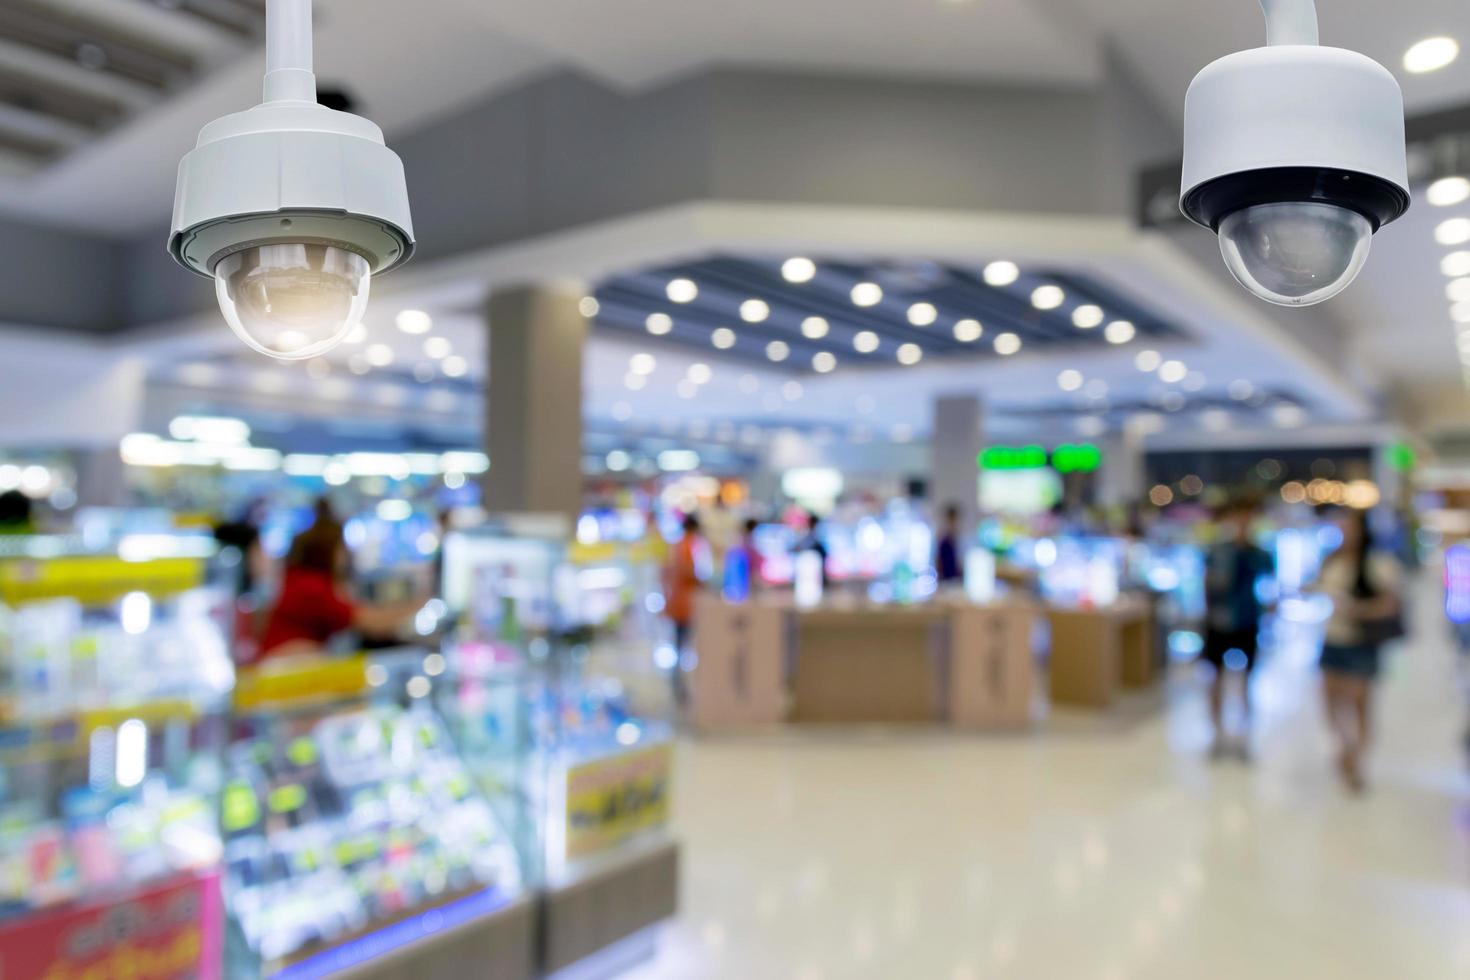 CCTV security camera photo